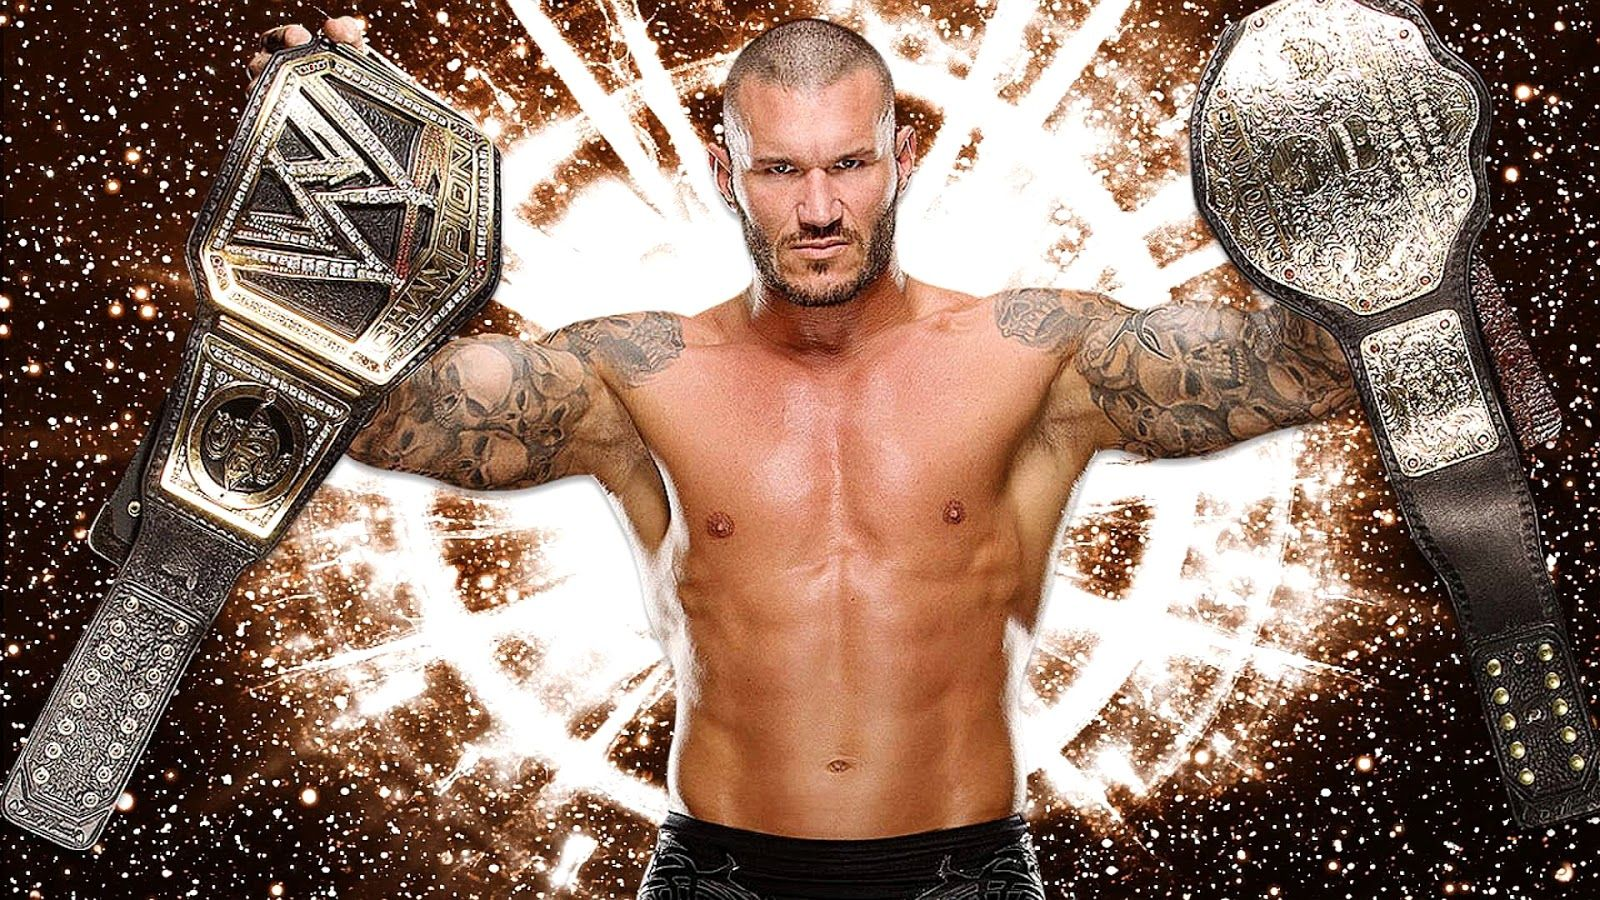 Randy Orton Wallpapers Hd Download Free 1080p Orton Randy Orton Randy Orton Wwe